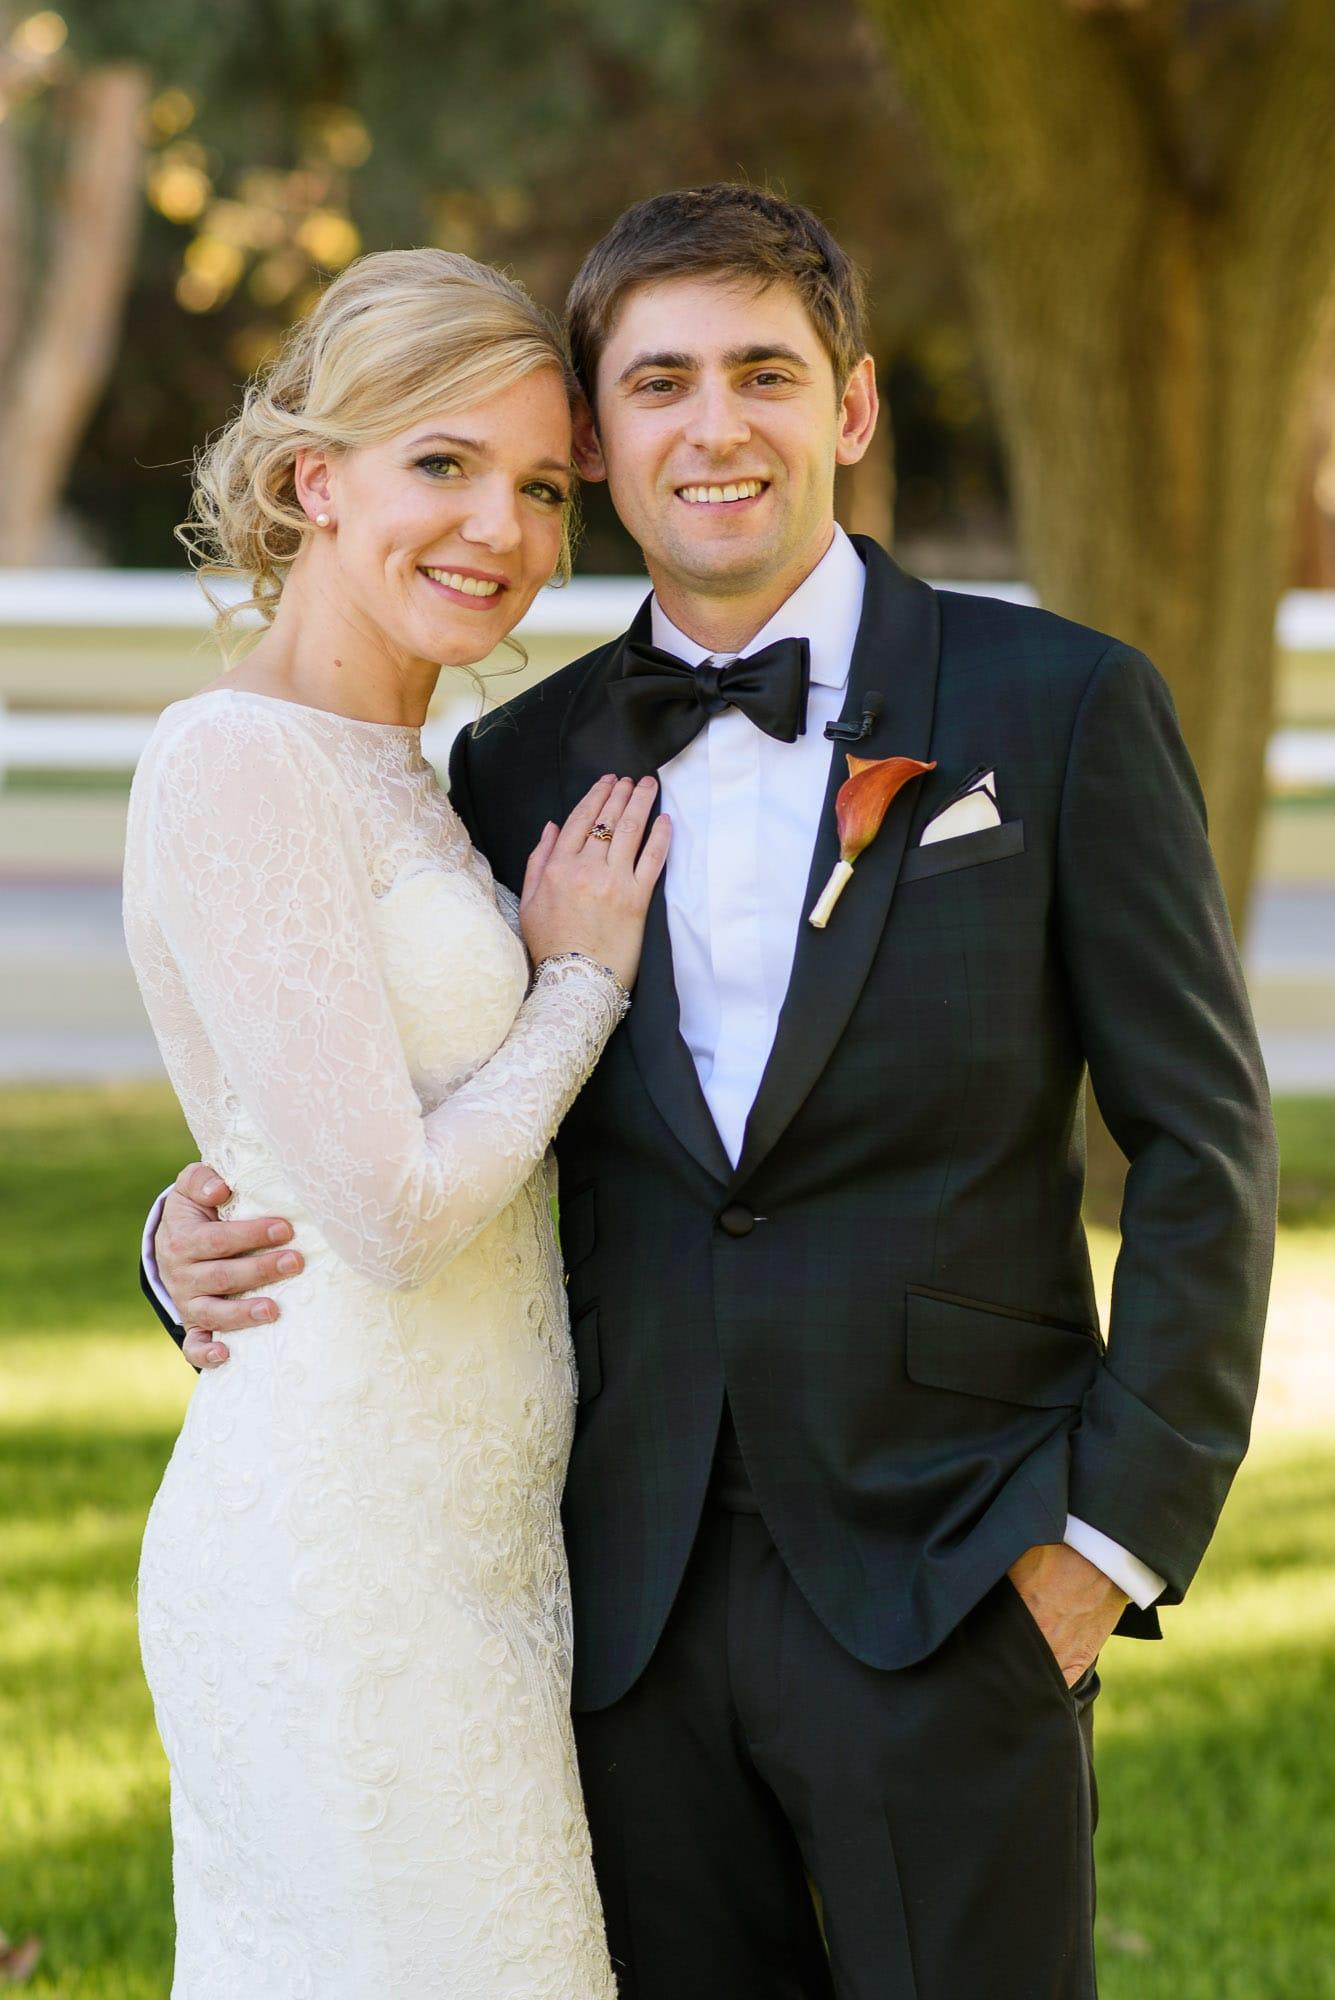 023_Alan_and_Heidi_Los_Angeles_Equestrian_Center_Wedding